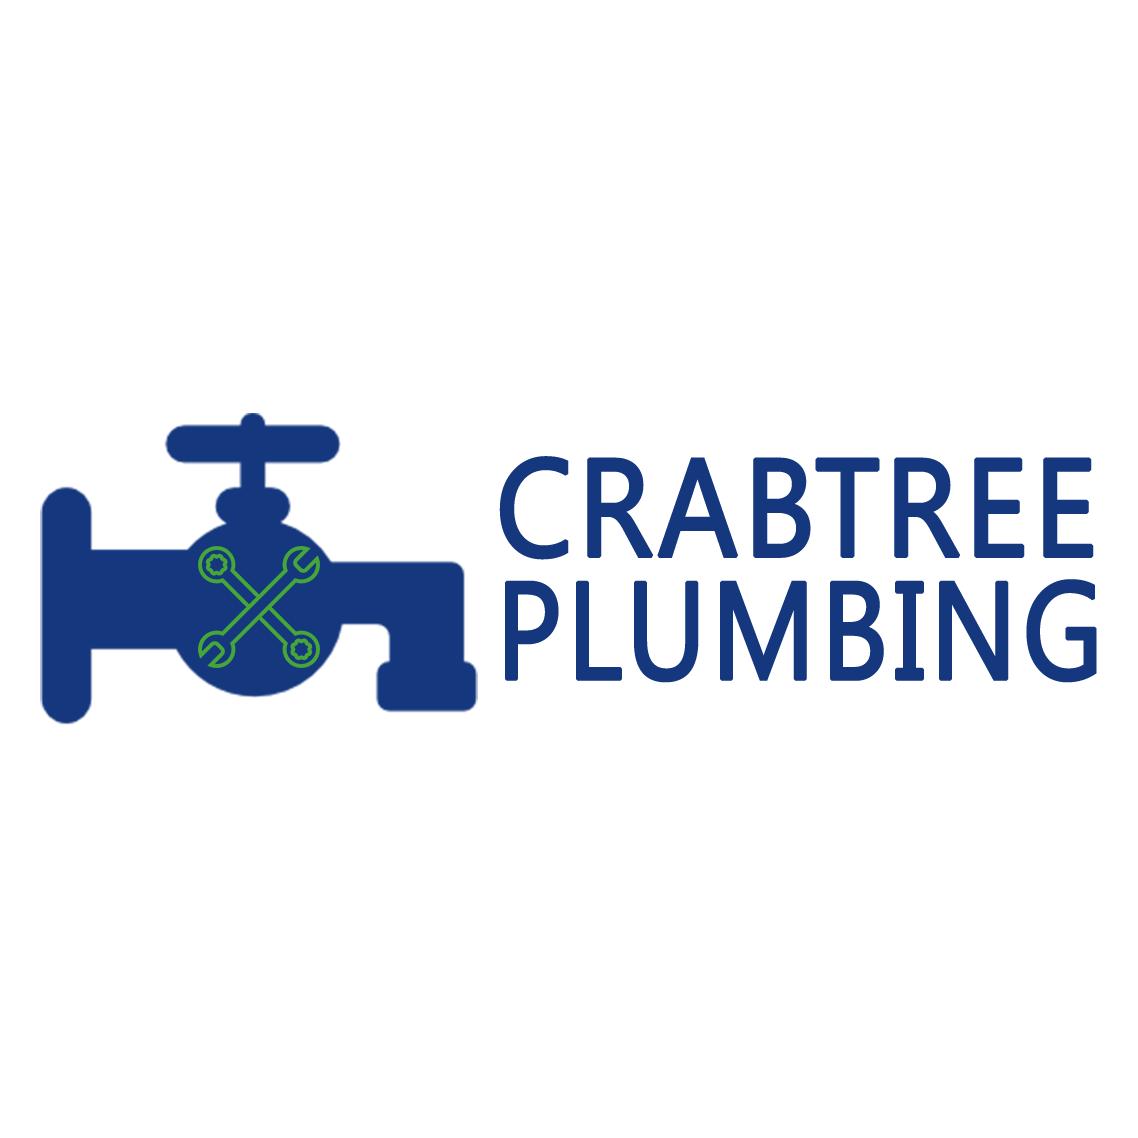 Crabtree Plumbing